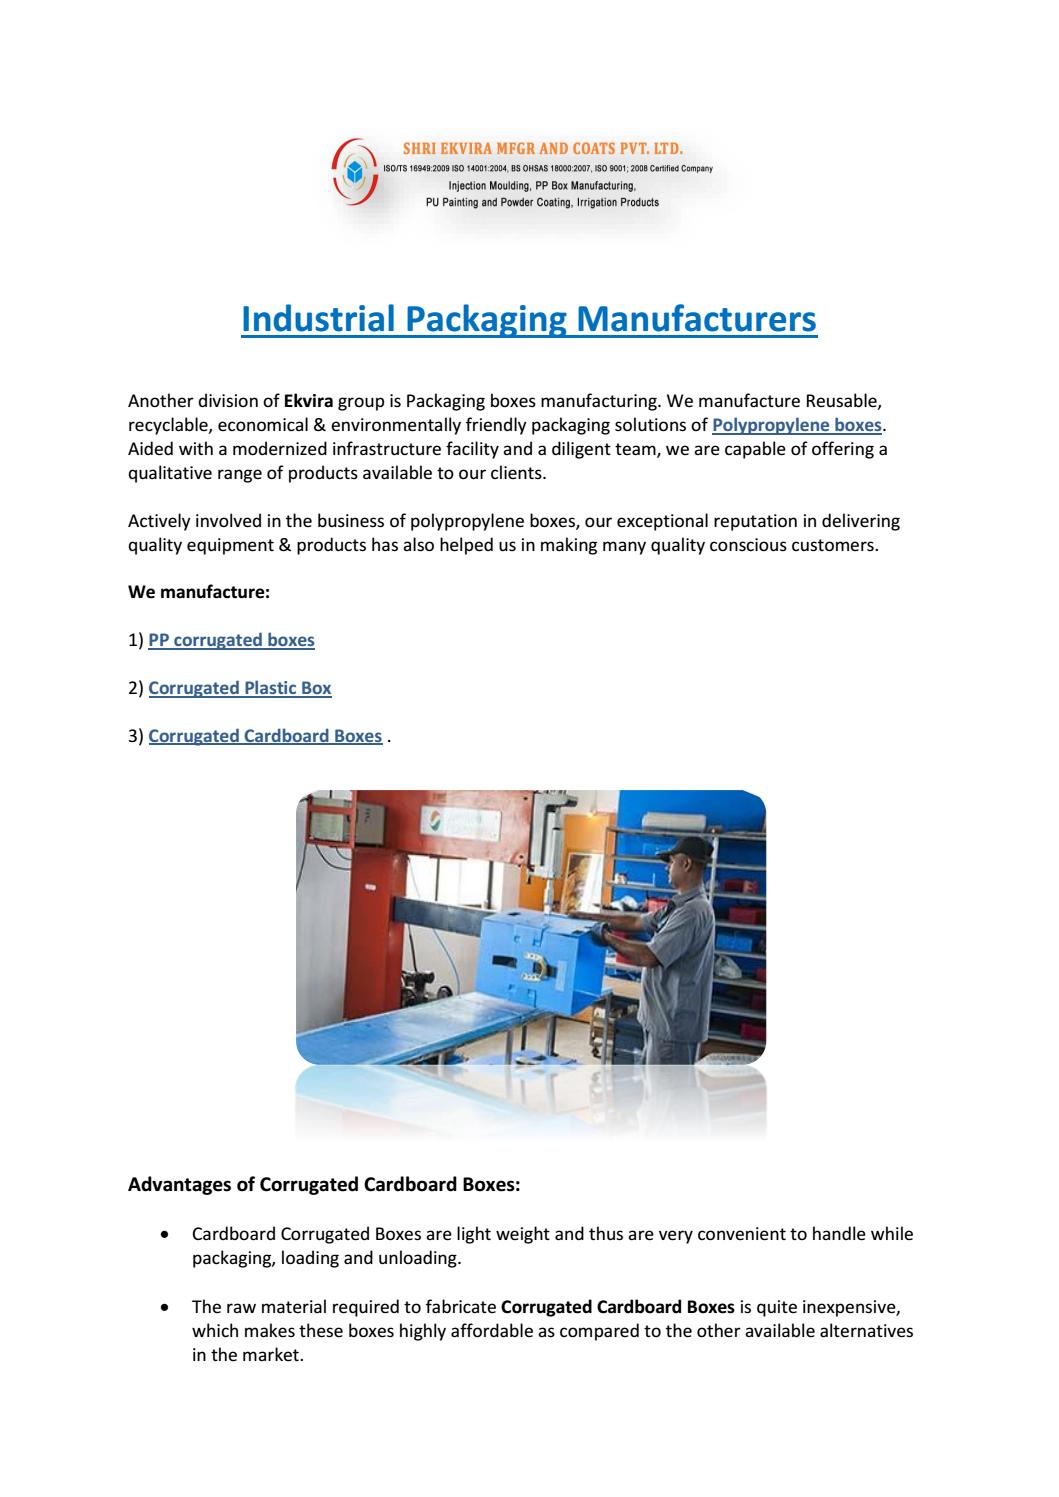 Industrial packaging manufacturers by Ekvira manufacturing